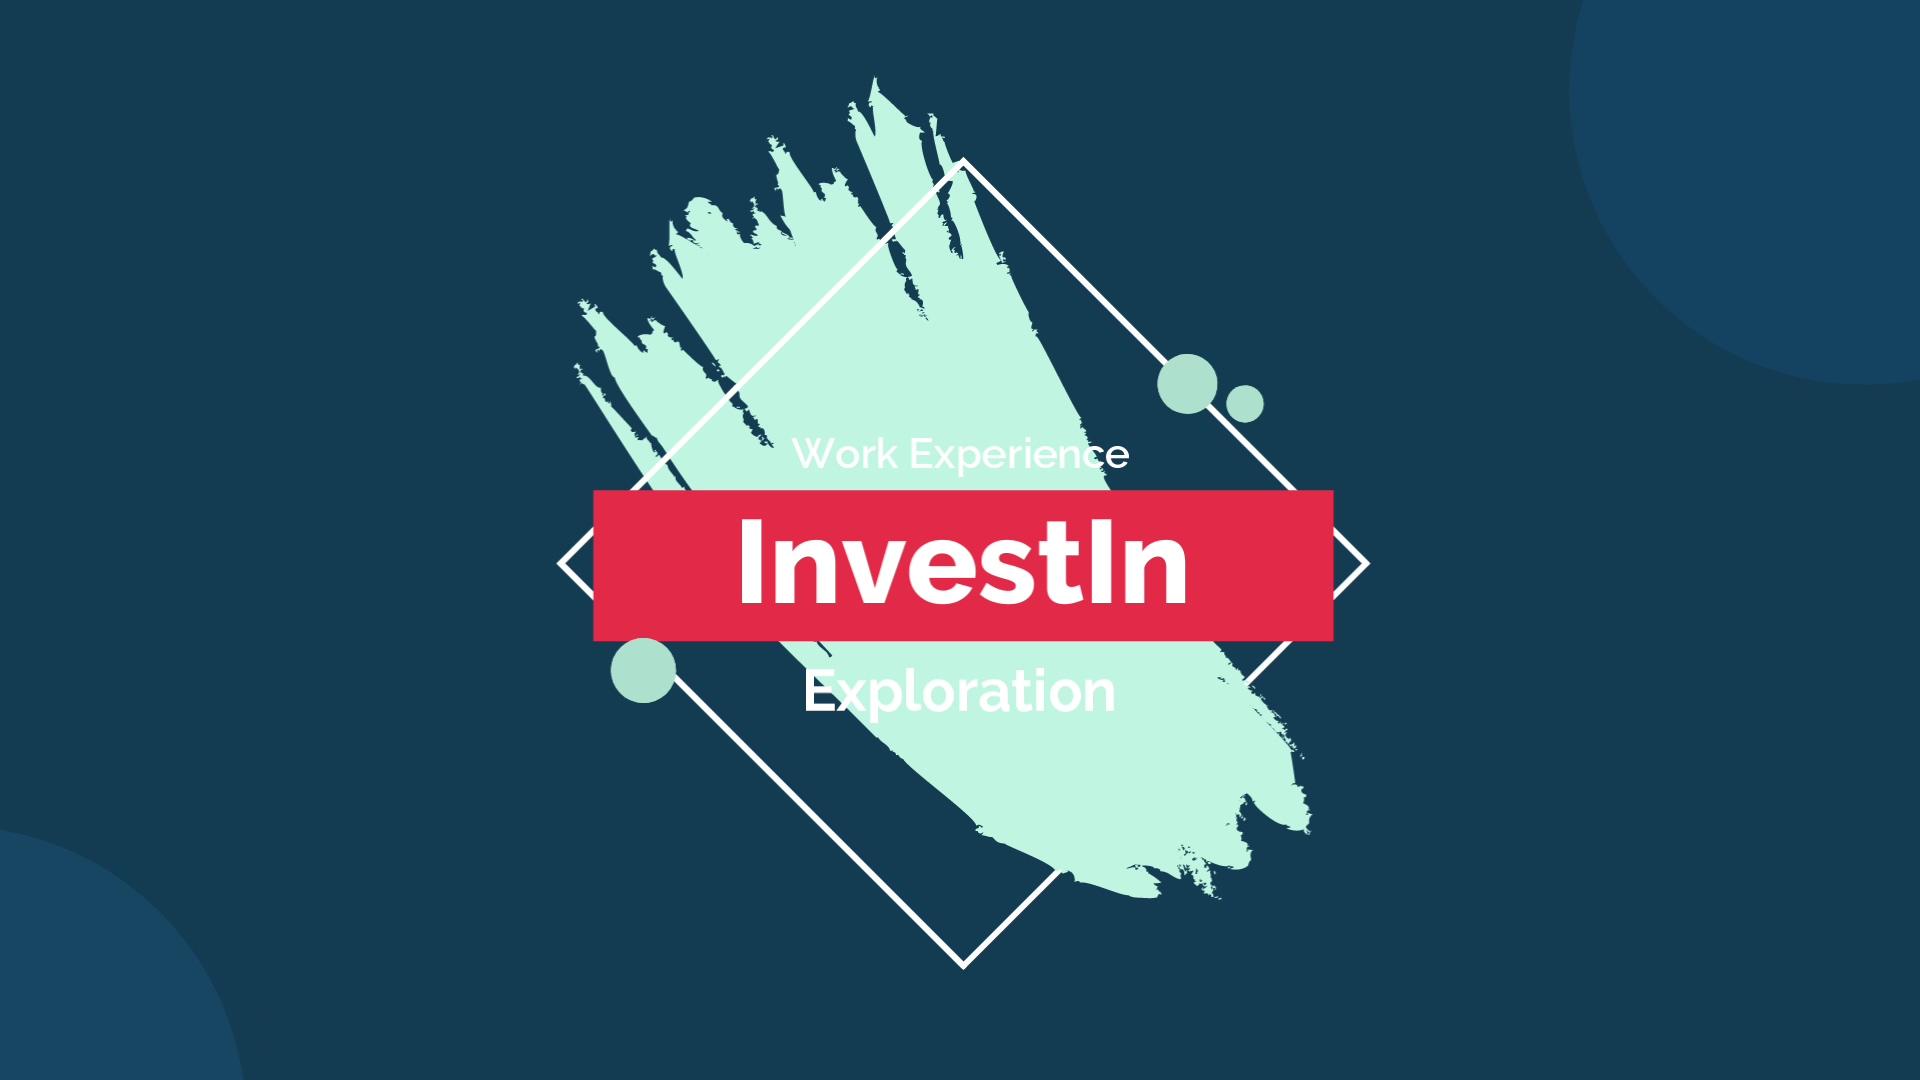 InvestIn Short Clip